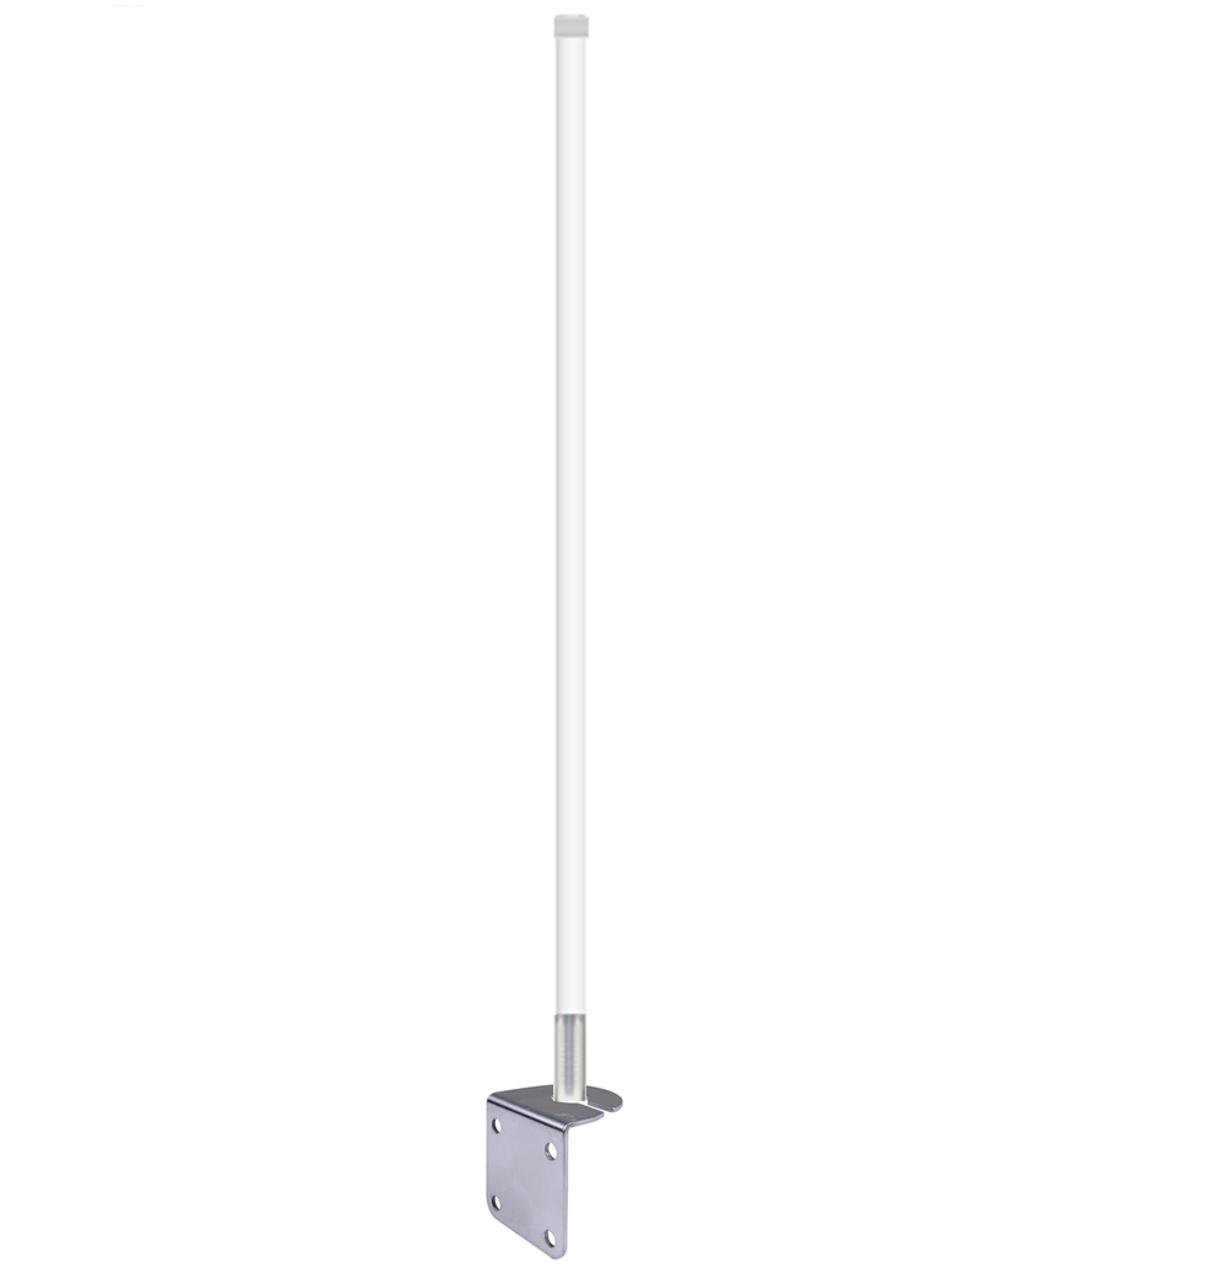 AG12dBi Cellular 3G 4G LTE Omni Directional Antenna w